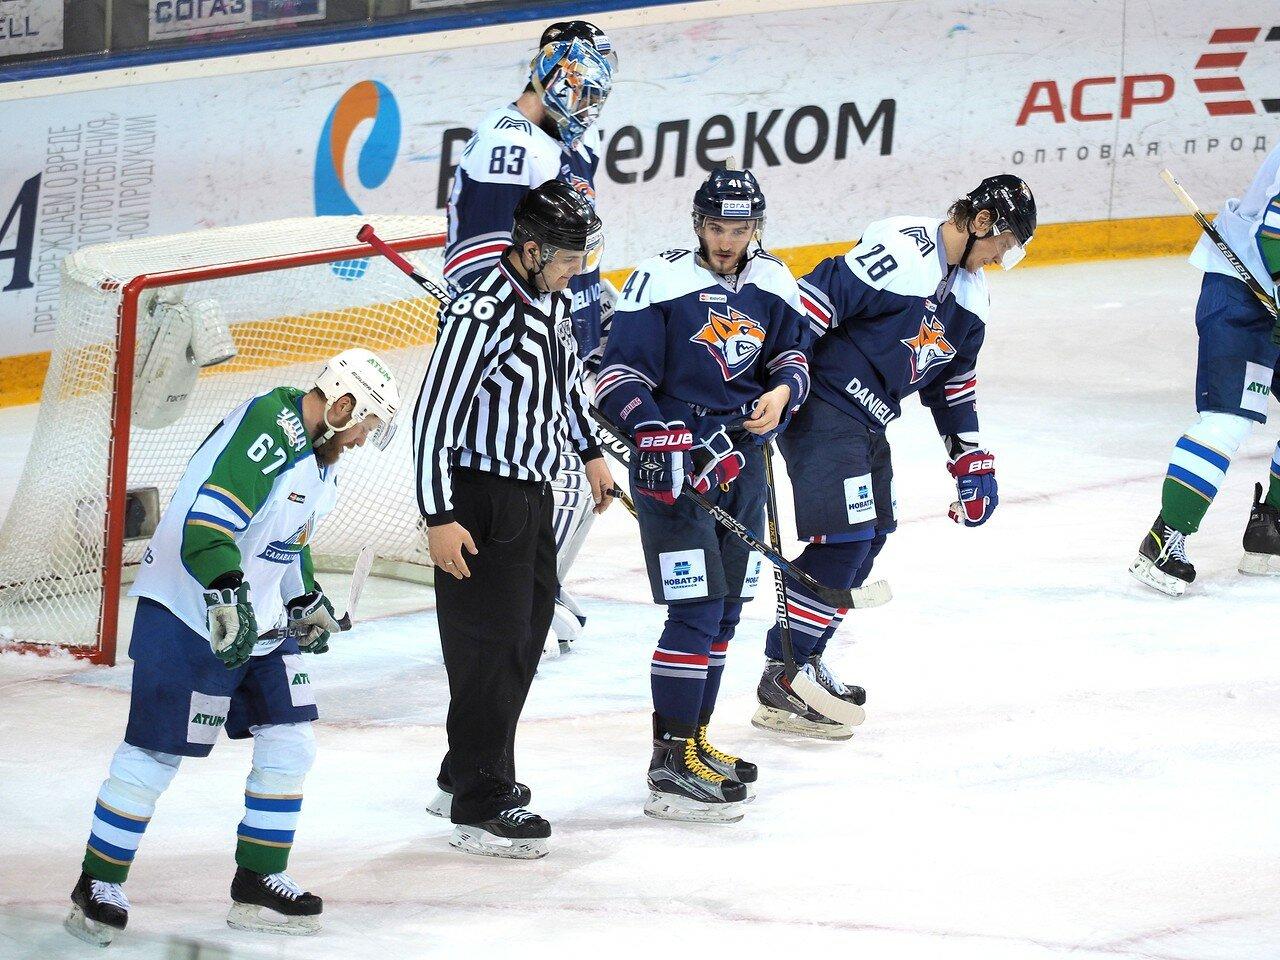 38Плей-офф 2016 Восток Финал Металлург - Салават Юлаев 25.03.2016